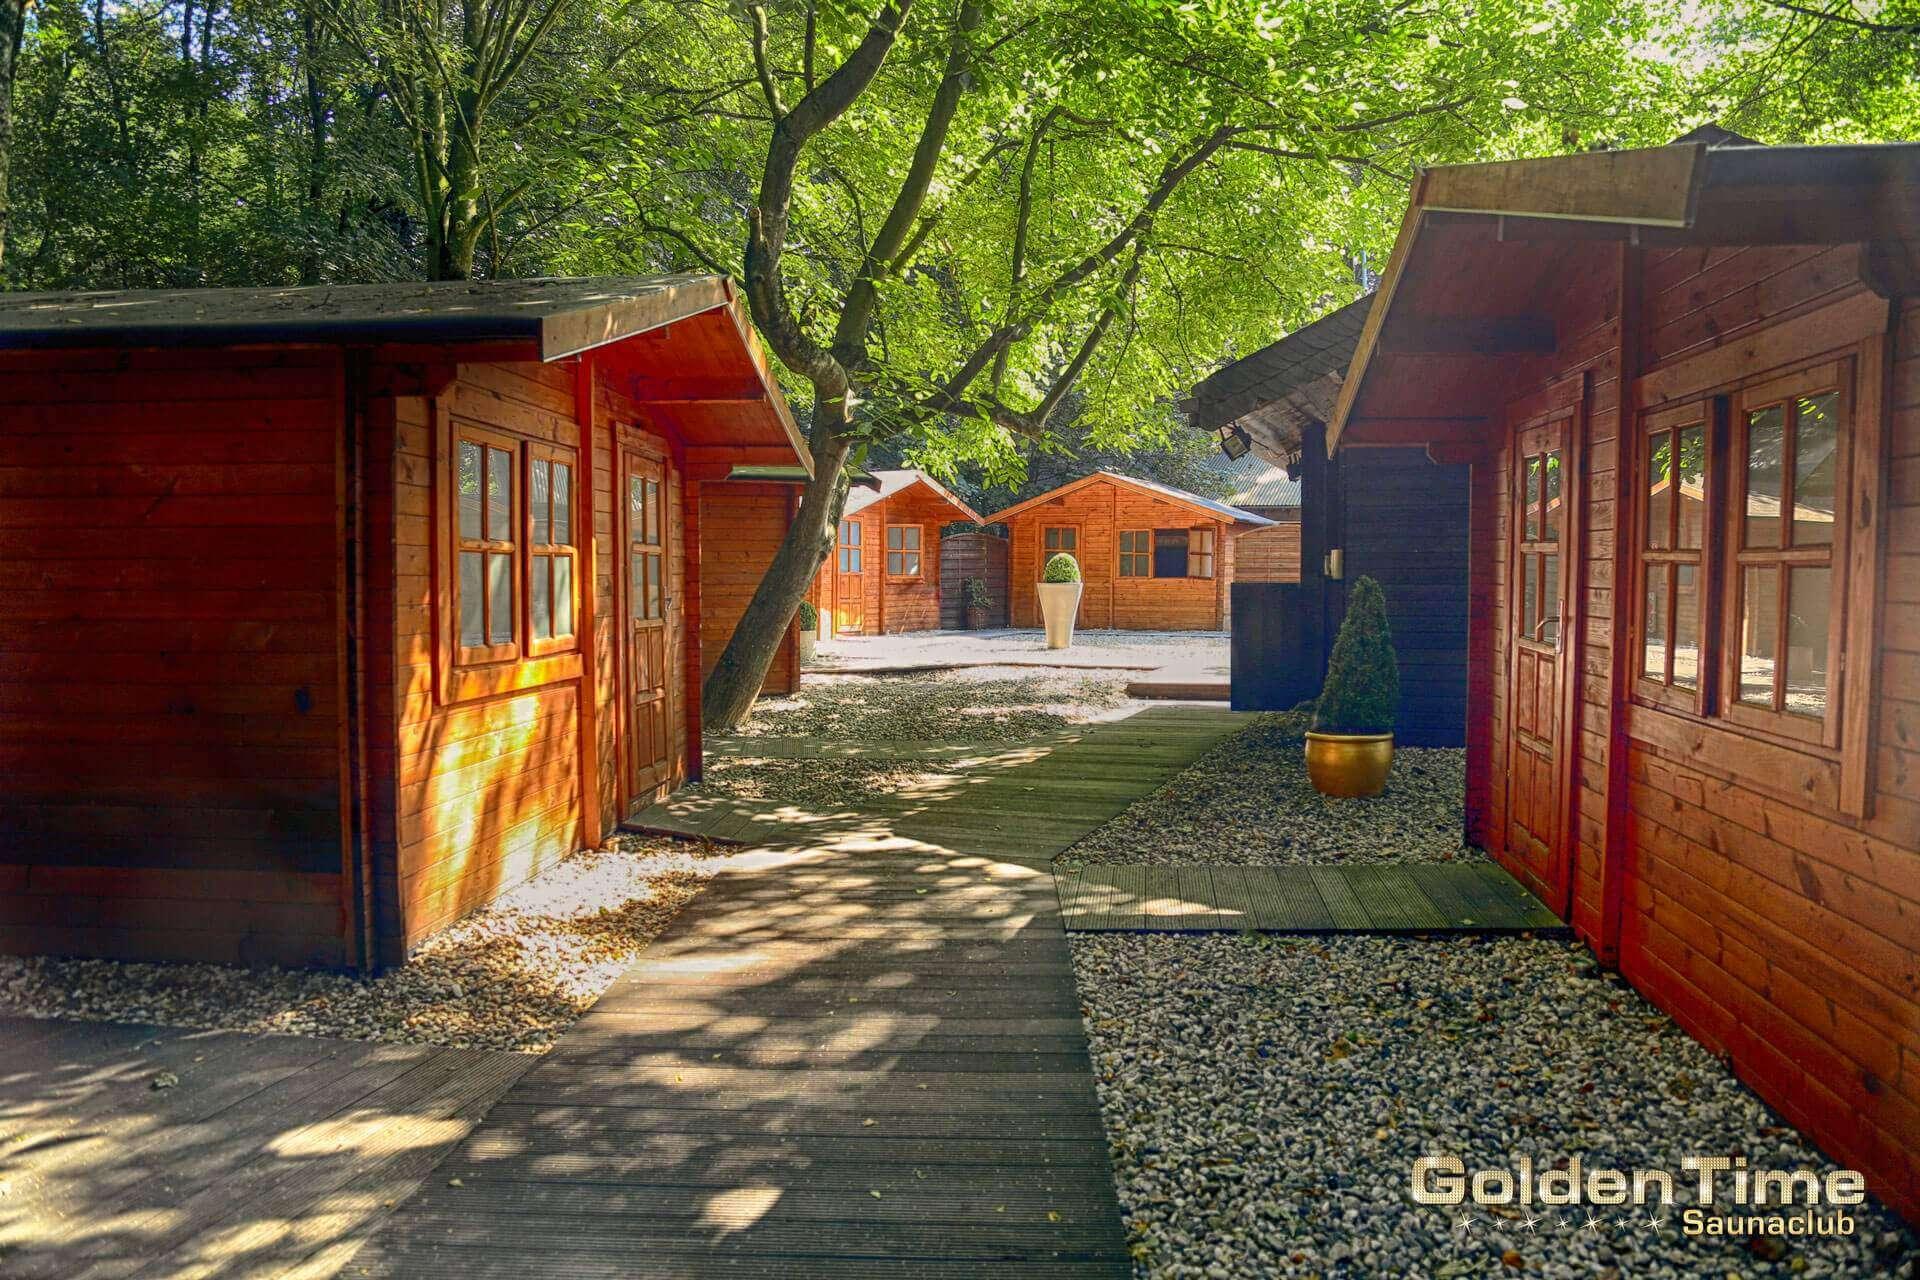 01-huetten-pic-04-goldentime-saunaclub.jpg